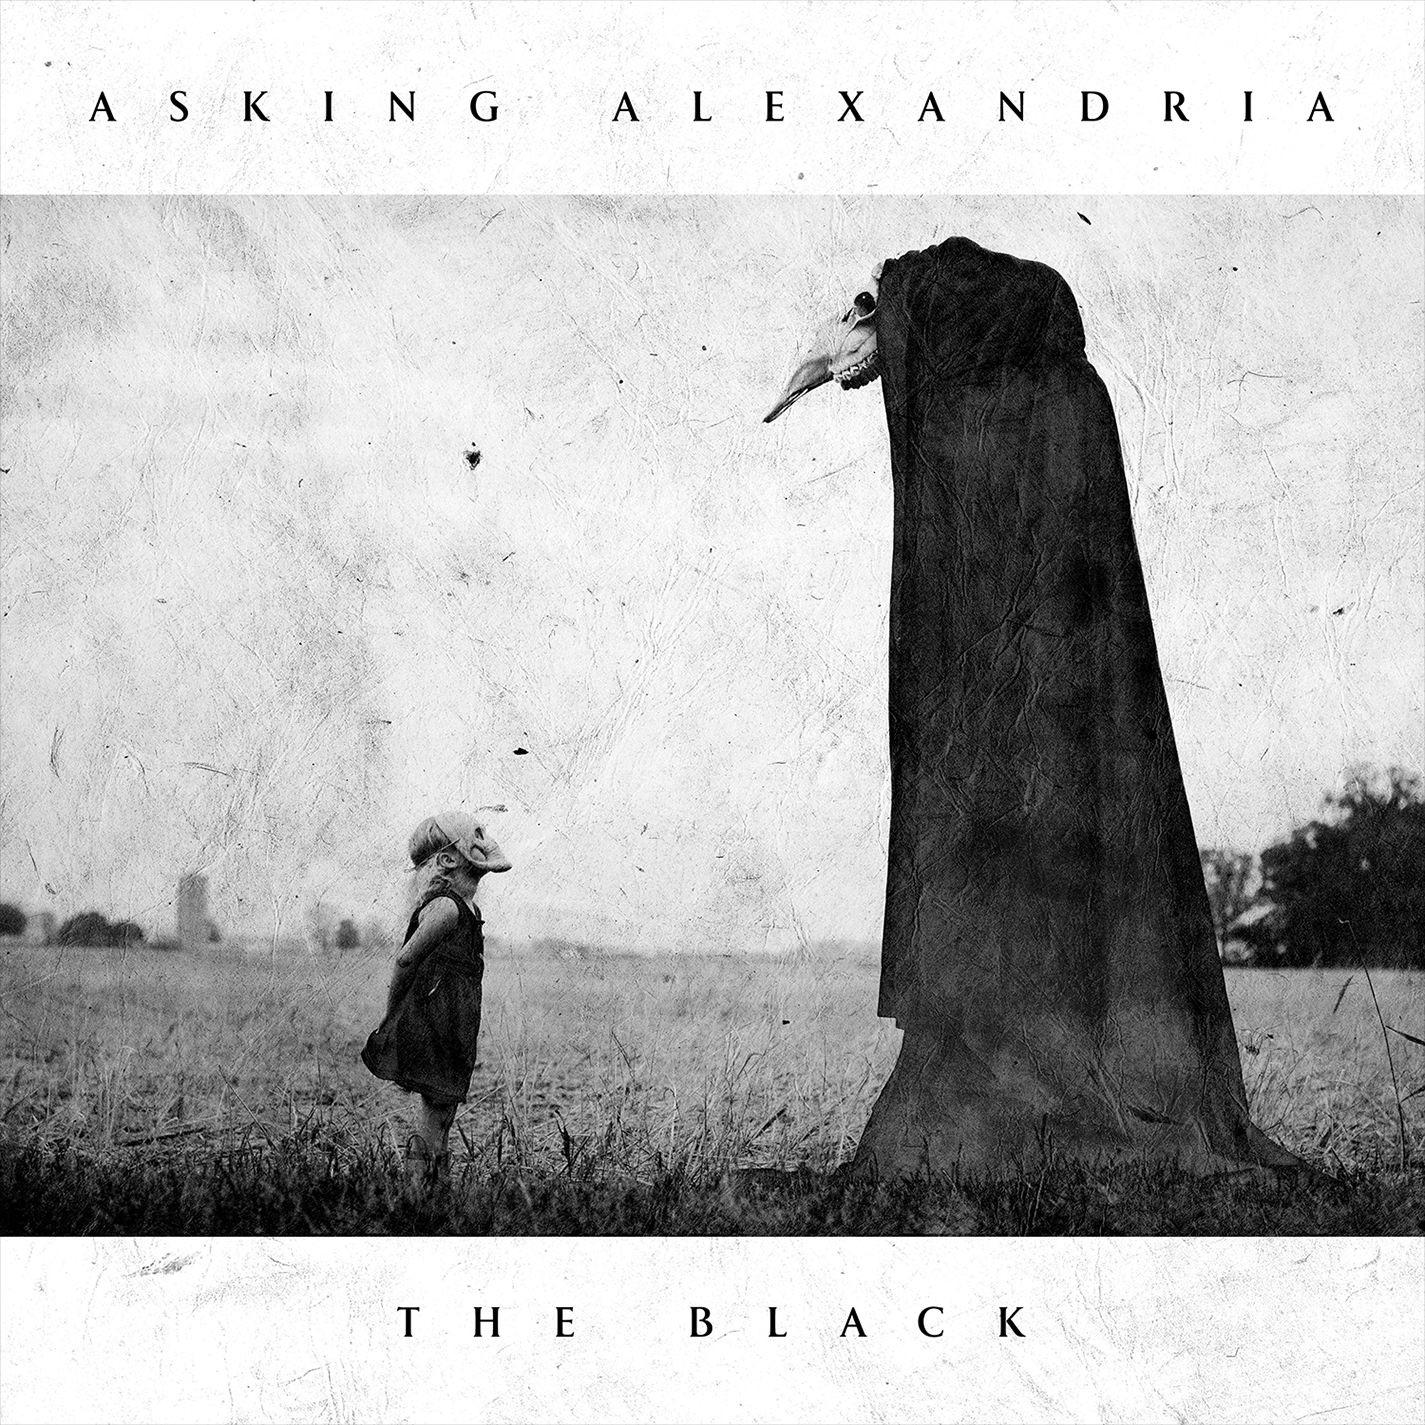 asking alexandria discography torrent